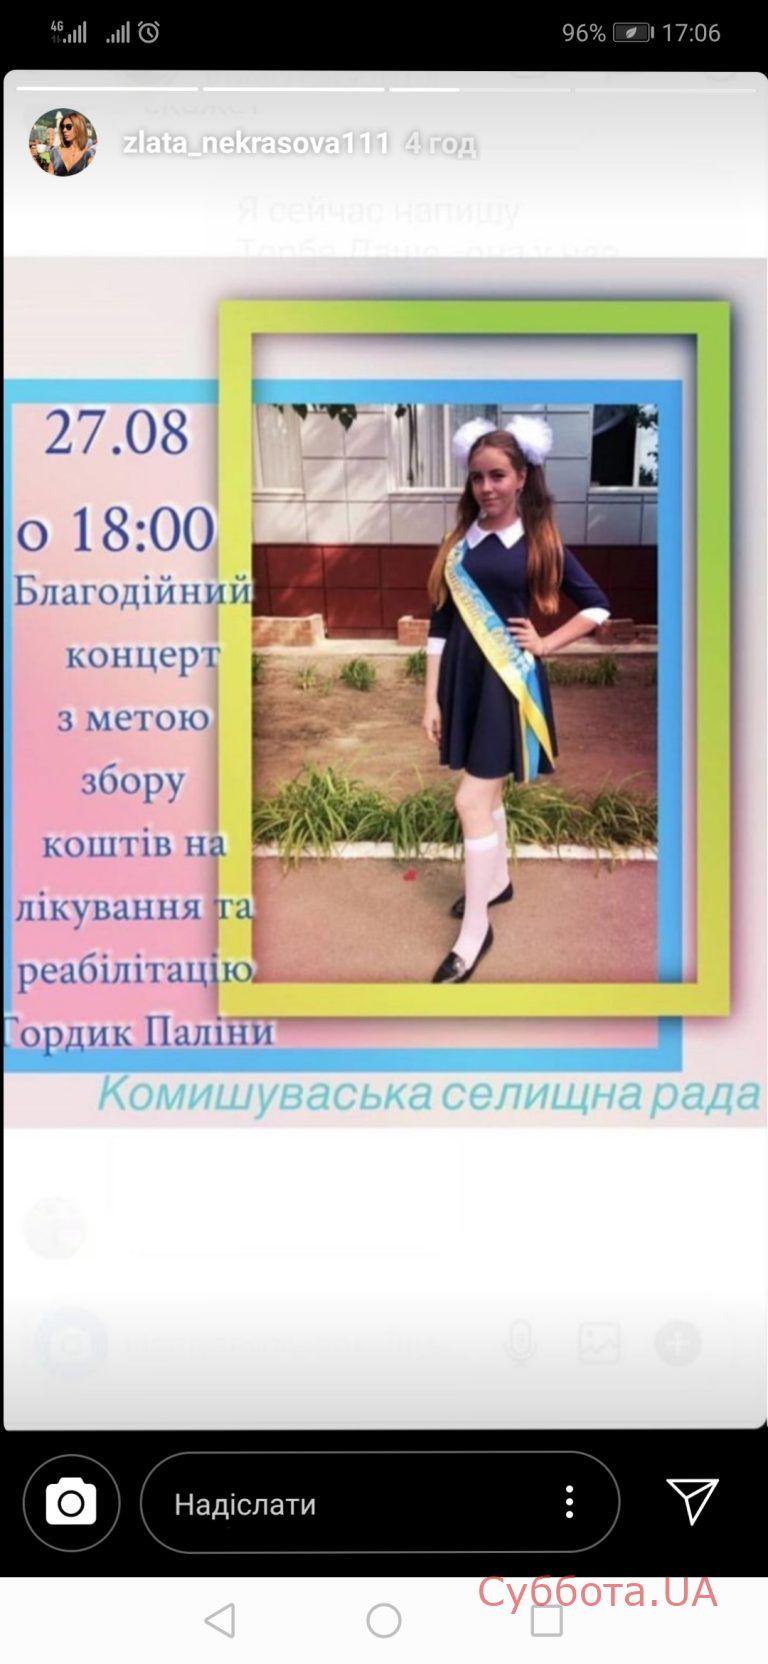 screenshot_20190826_170635_com.instagram.android-768x1664